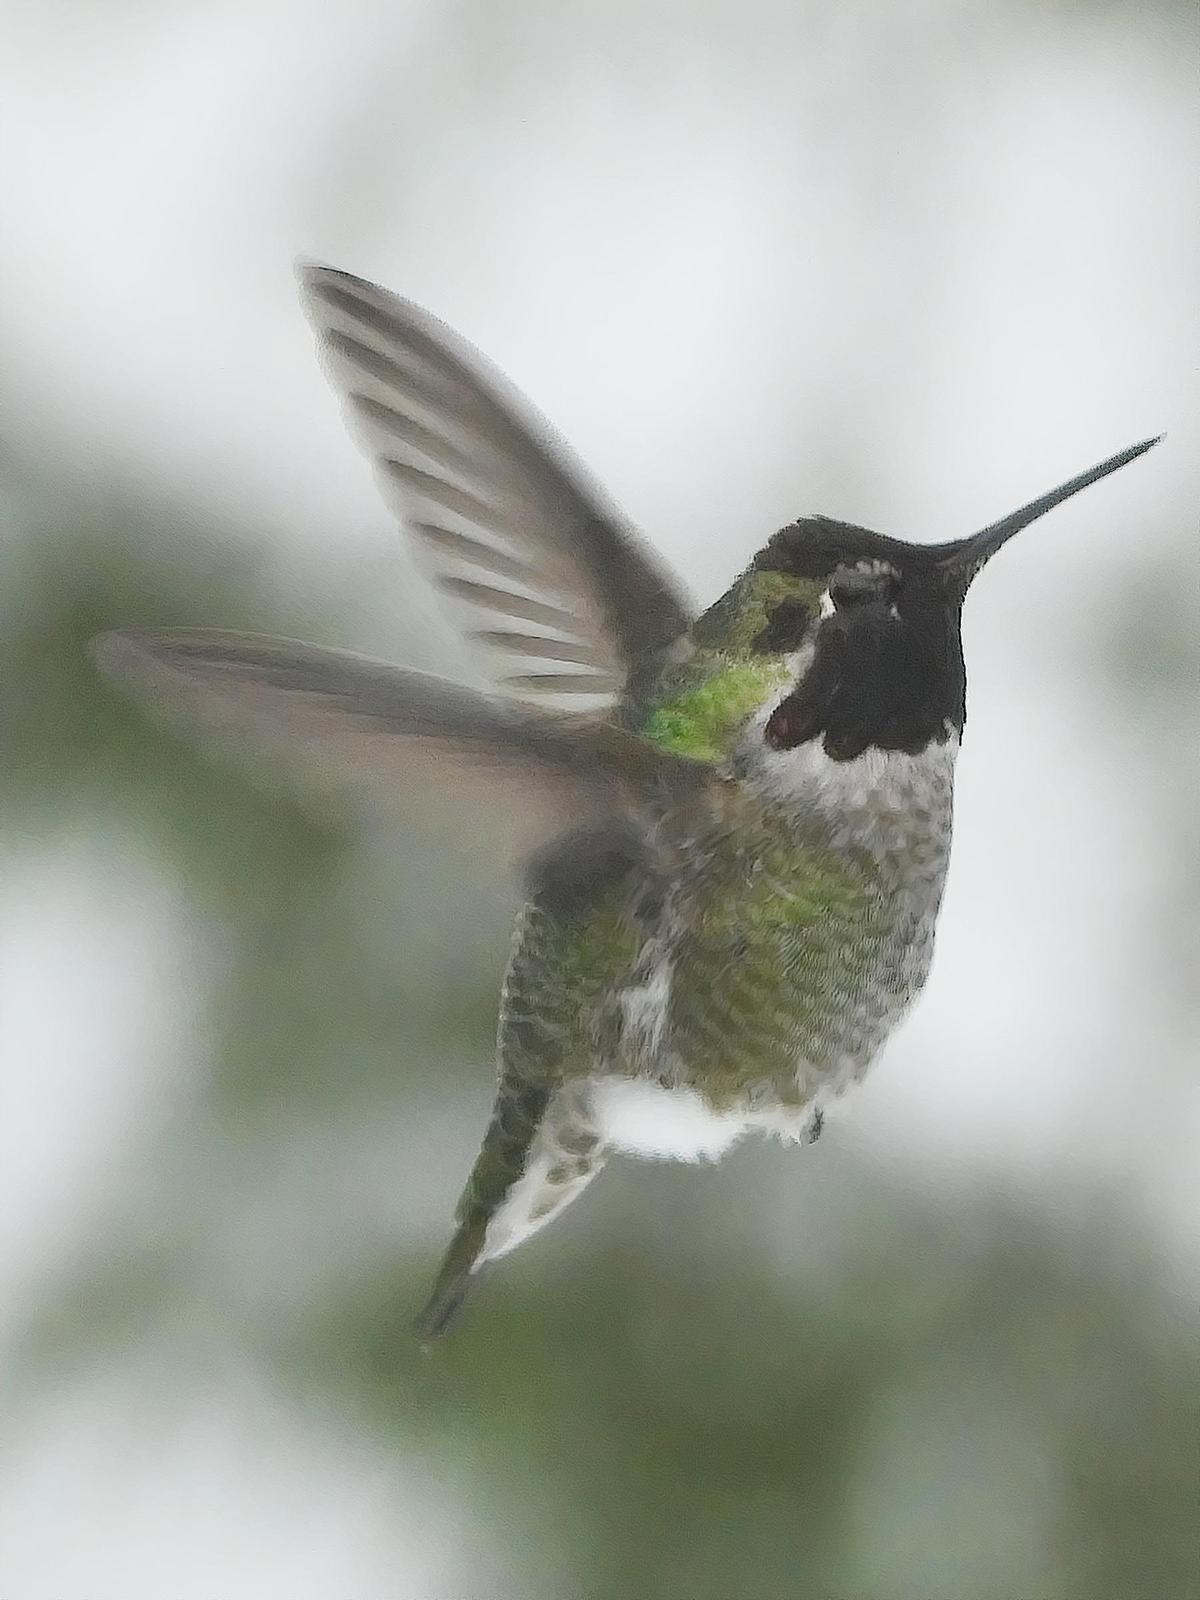 Anna's Hummingbird Photo by Dan Tallman